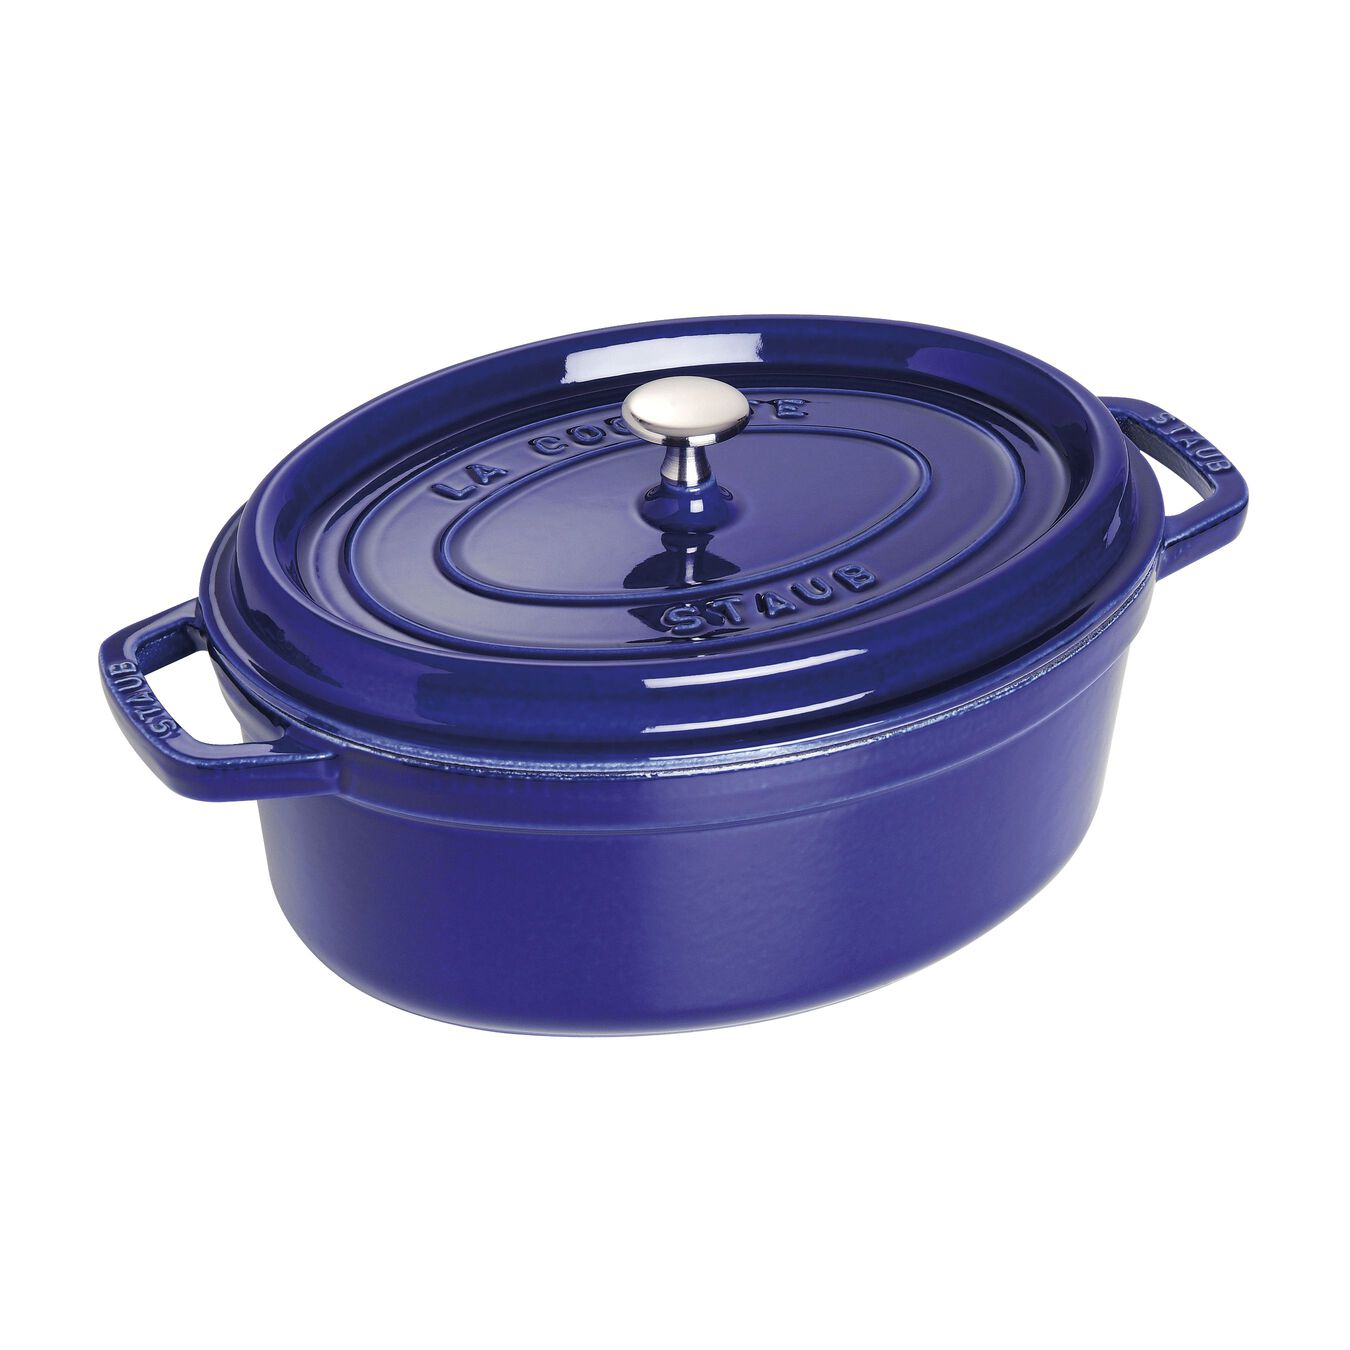 4.25 l Cast iron oval Cocotte, Dark-Blue,,large 1